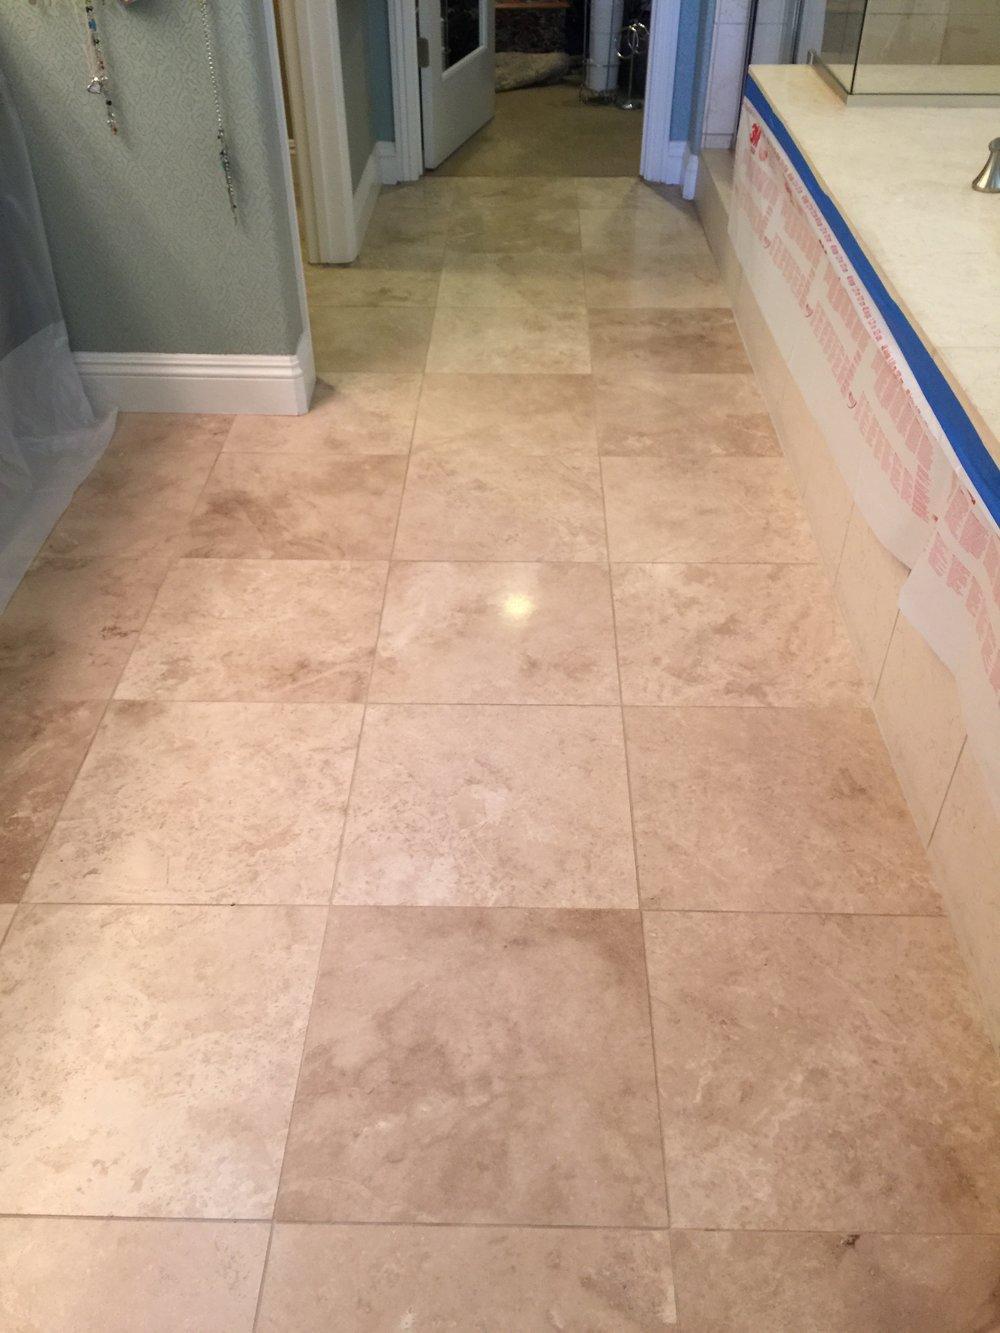 Travertine floor before coating...